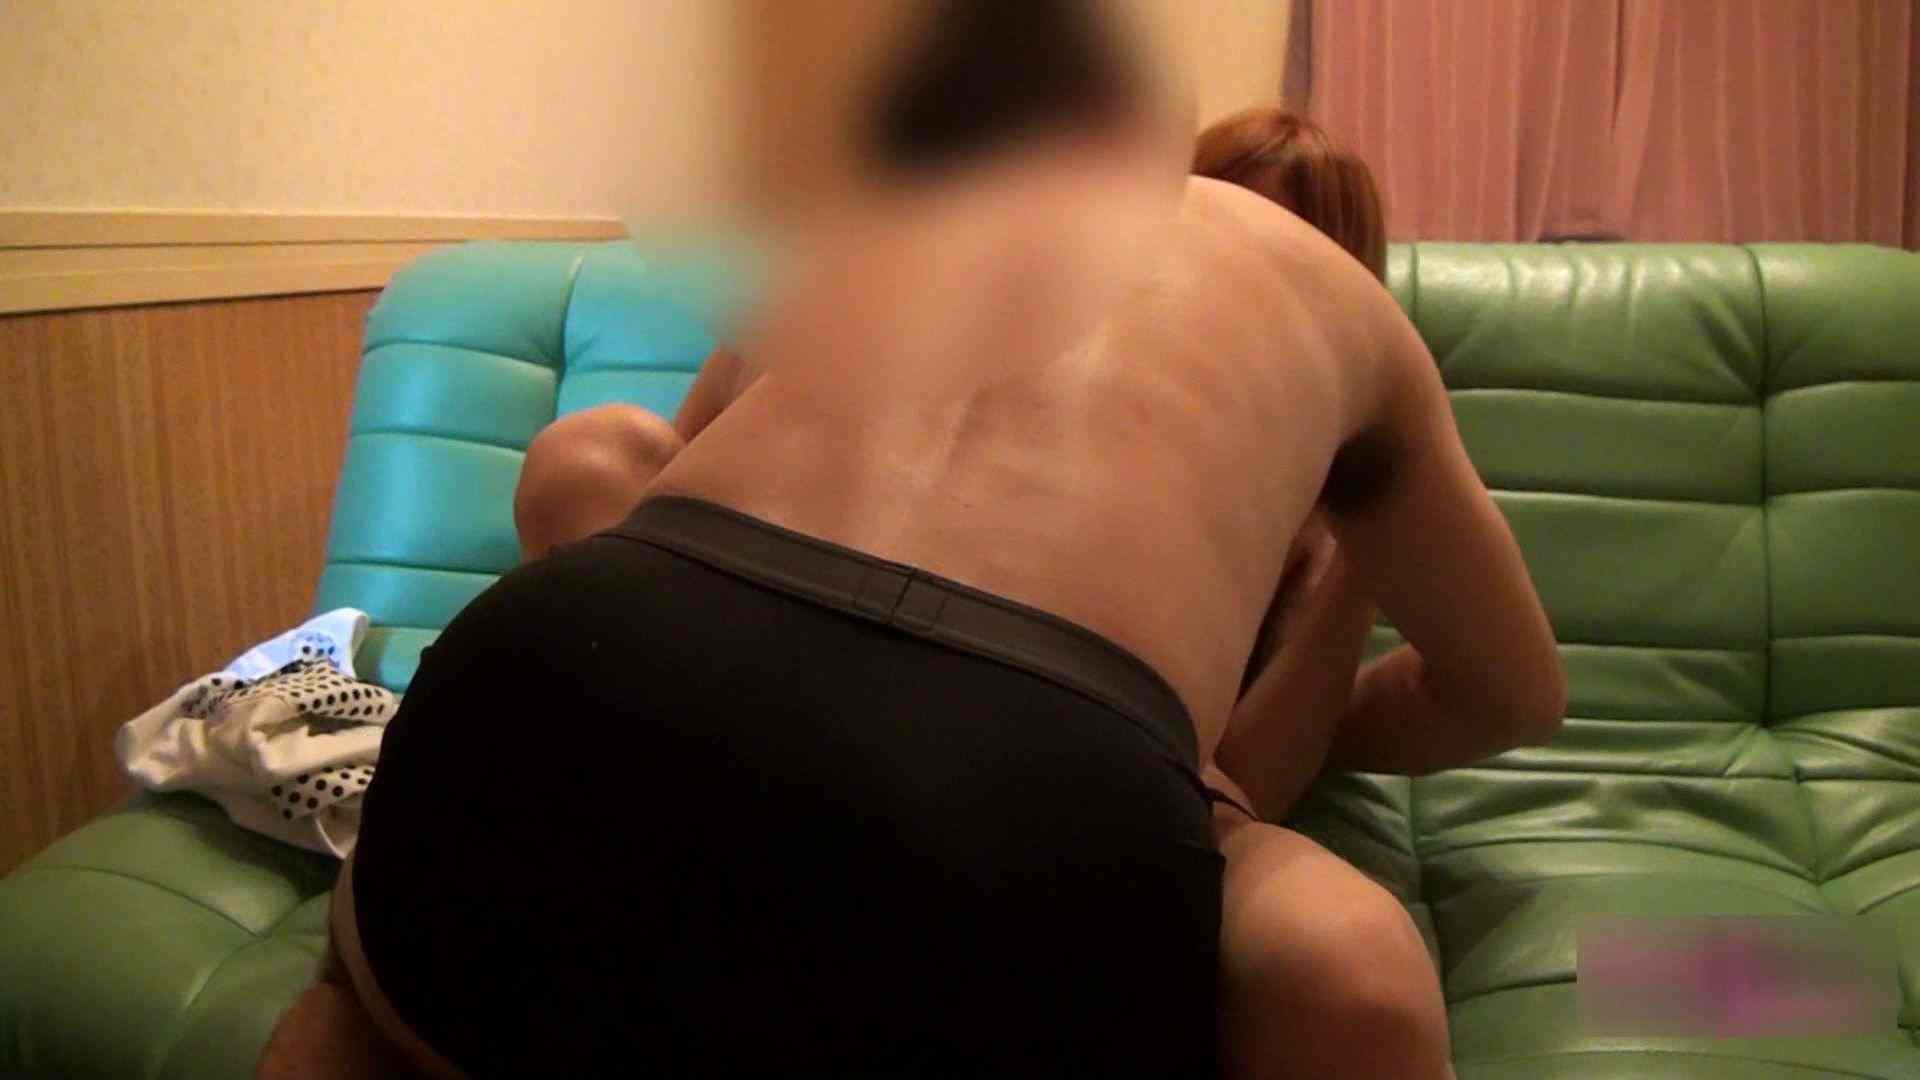 S級厳選美女ビッチガールVol.01 OLエロ画像  35PICs 16